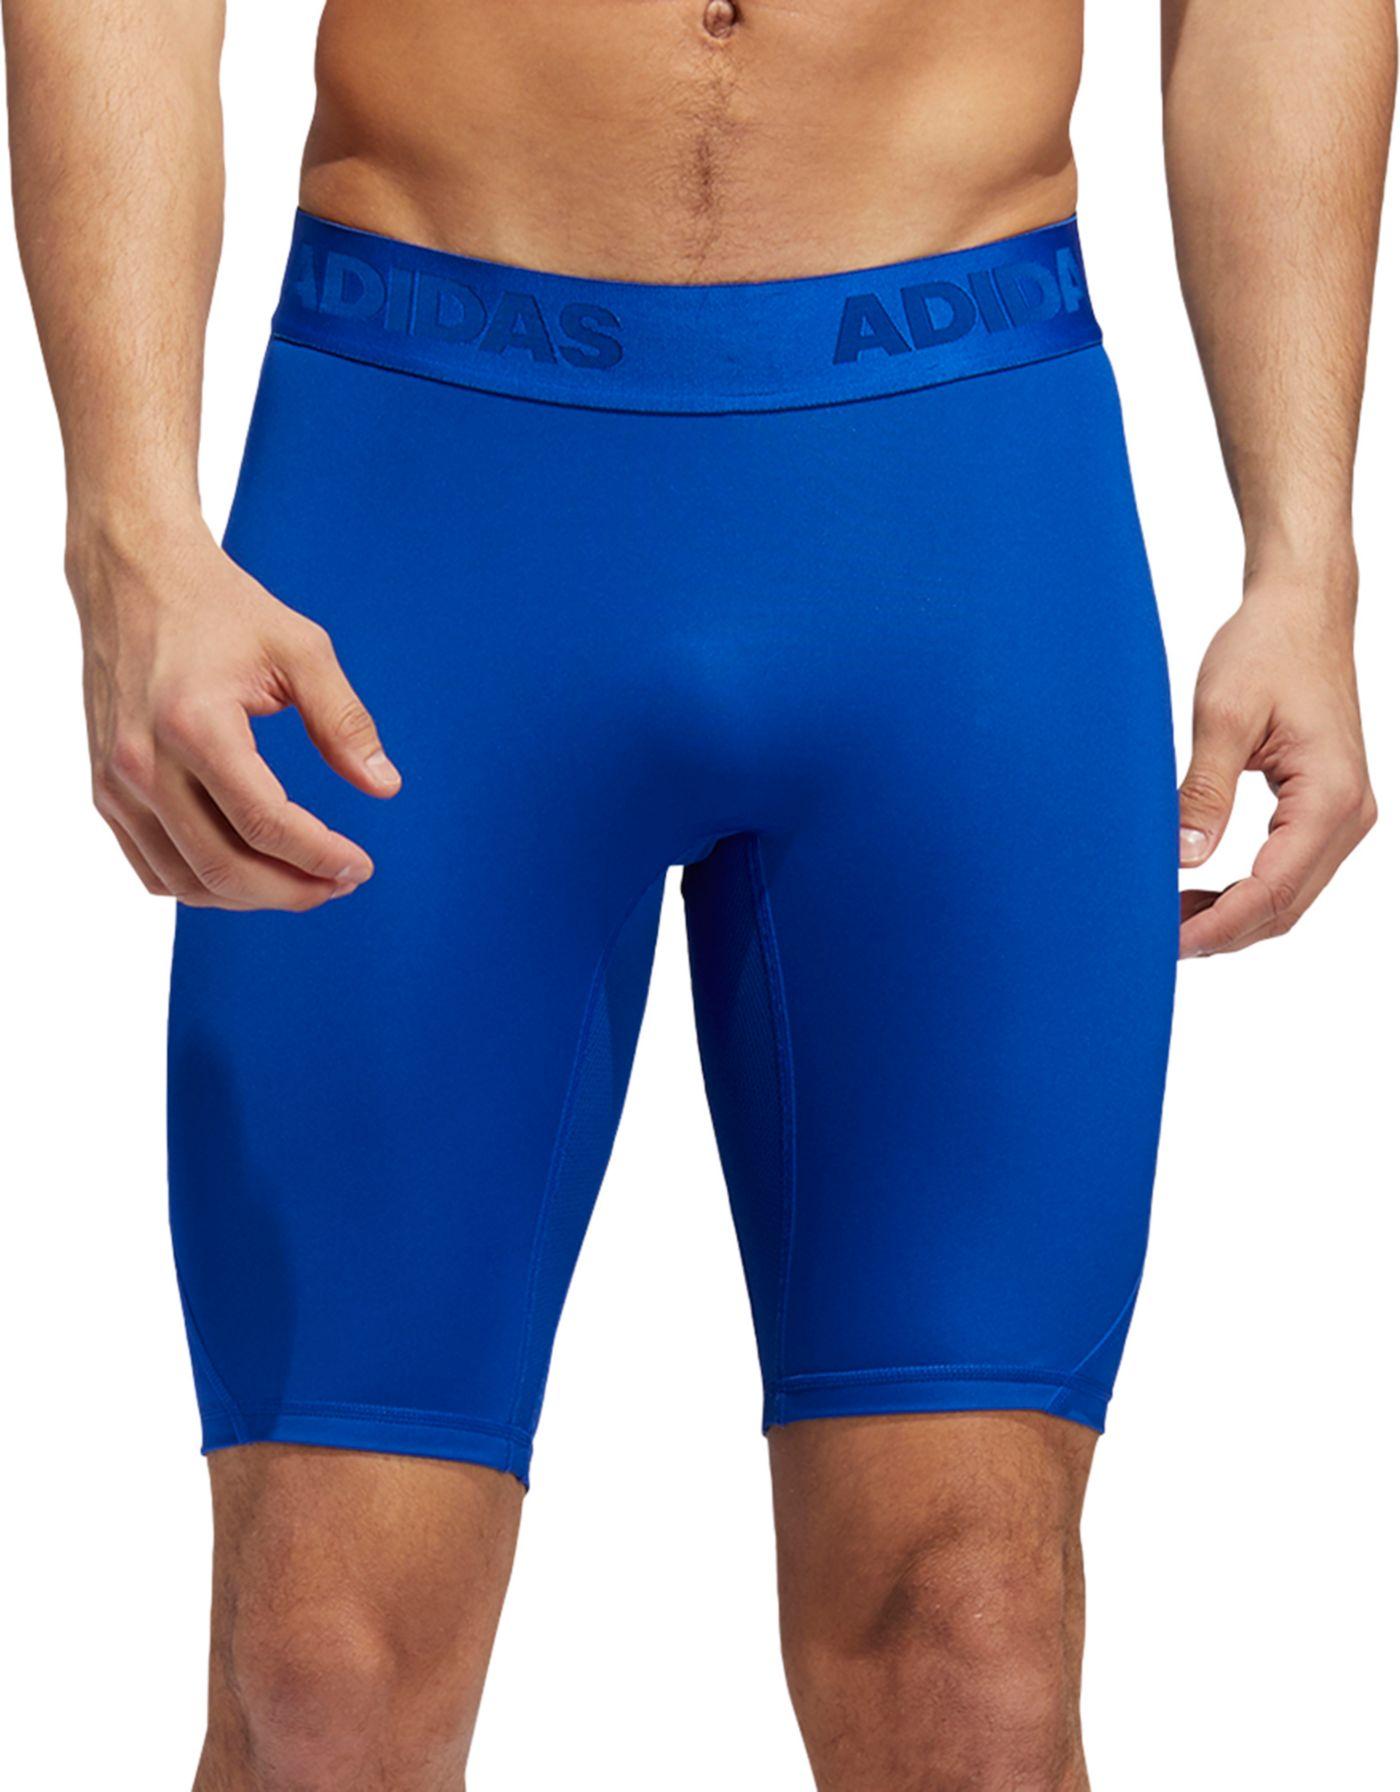 adidas Men's Alphaskin Sport Training Fitted Shorts